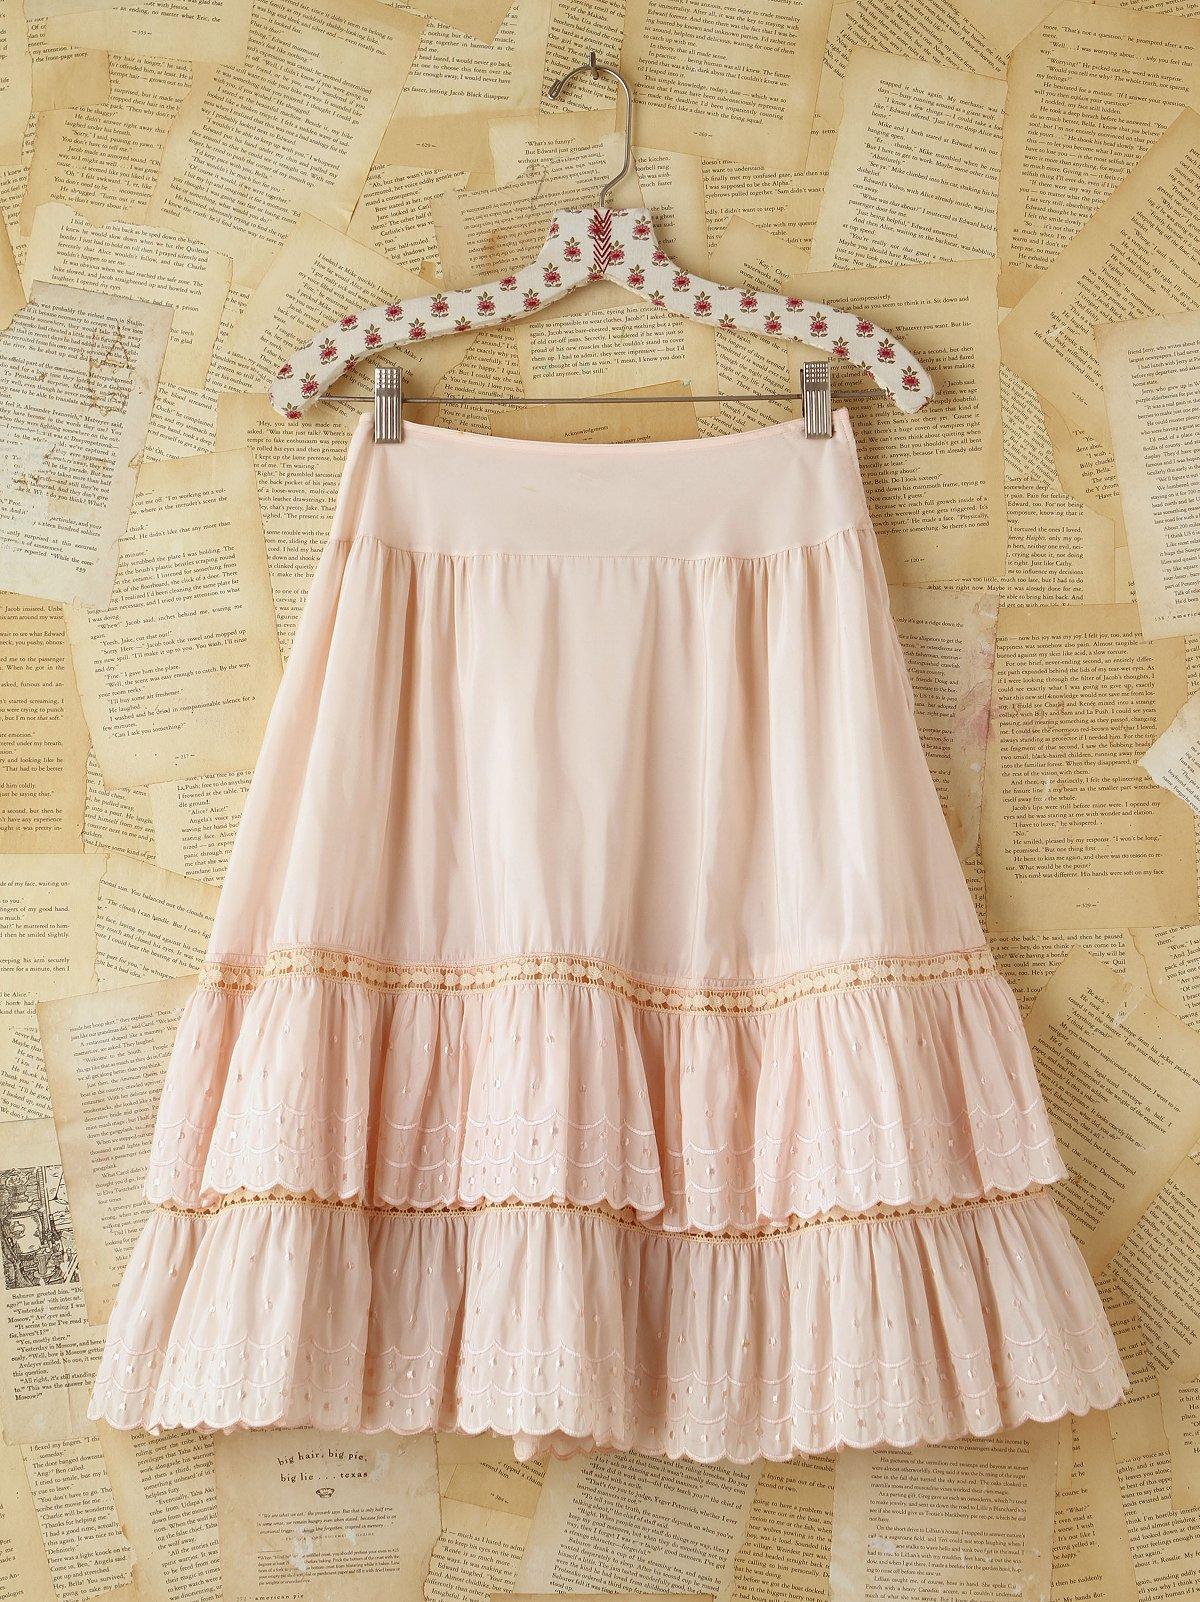 Vintage Pink Layered Skirt